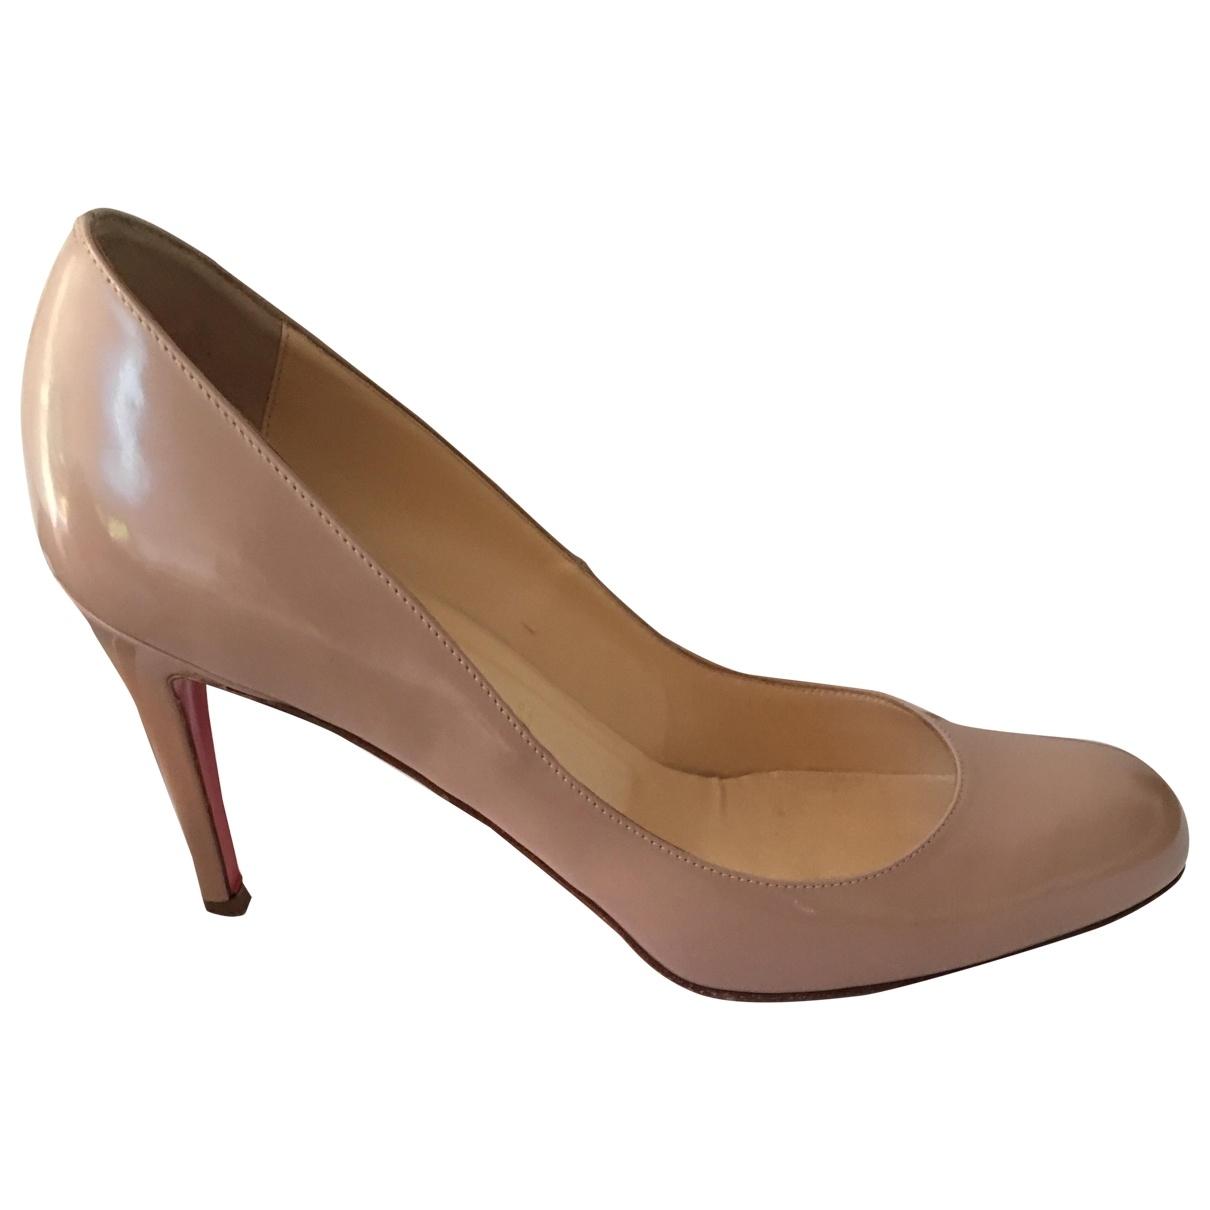 Christian Louboutin Simple pump Patent leather Heels for Women 40 EU